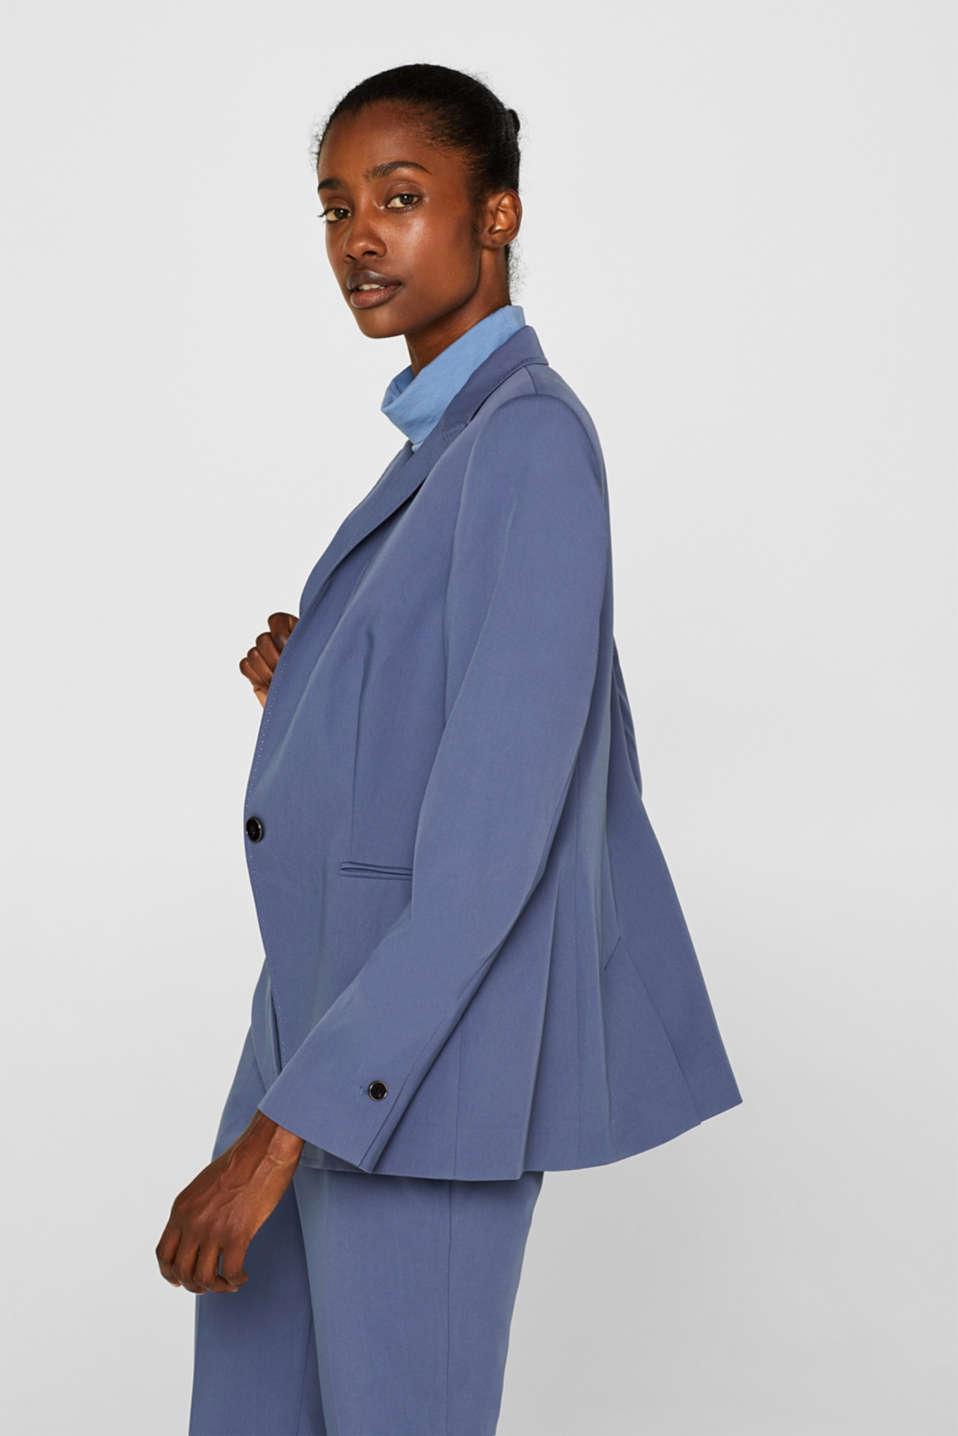 STITCHING mix + match stretch blazer, GREY BLUE 2, detail image number 5